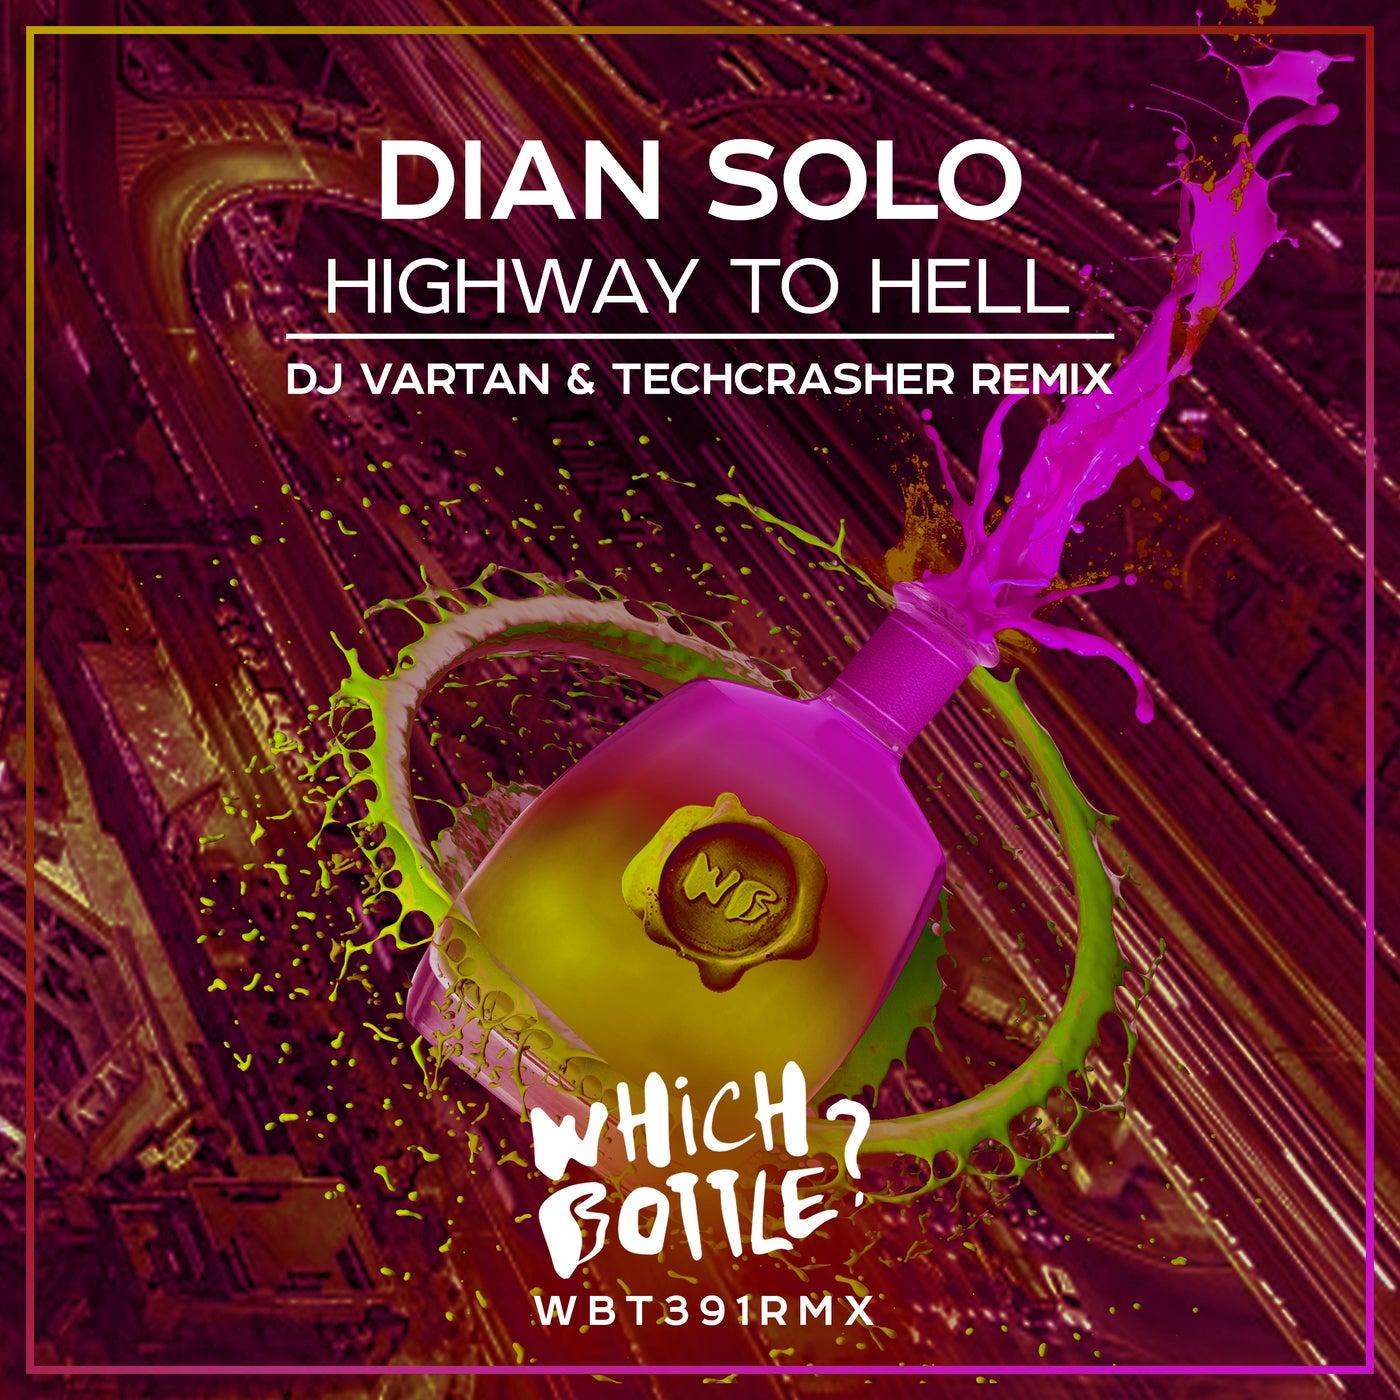 Highway To Hell (DJ Vartan & Techcrasher Remix)